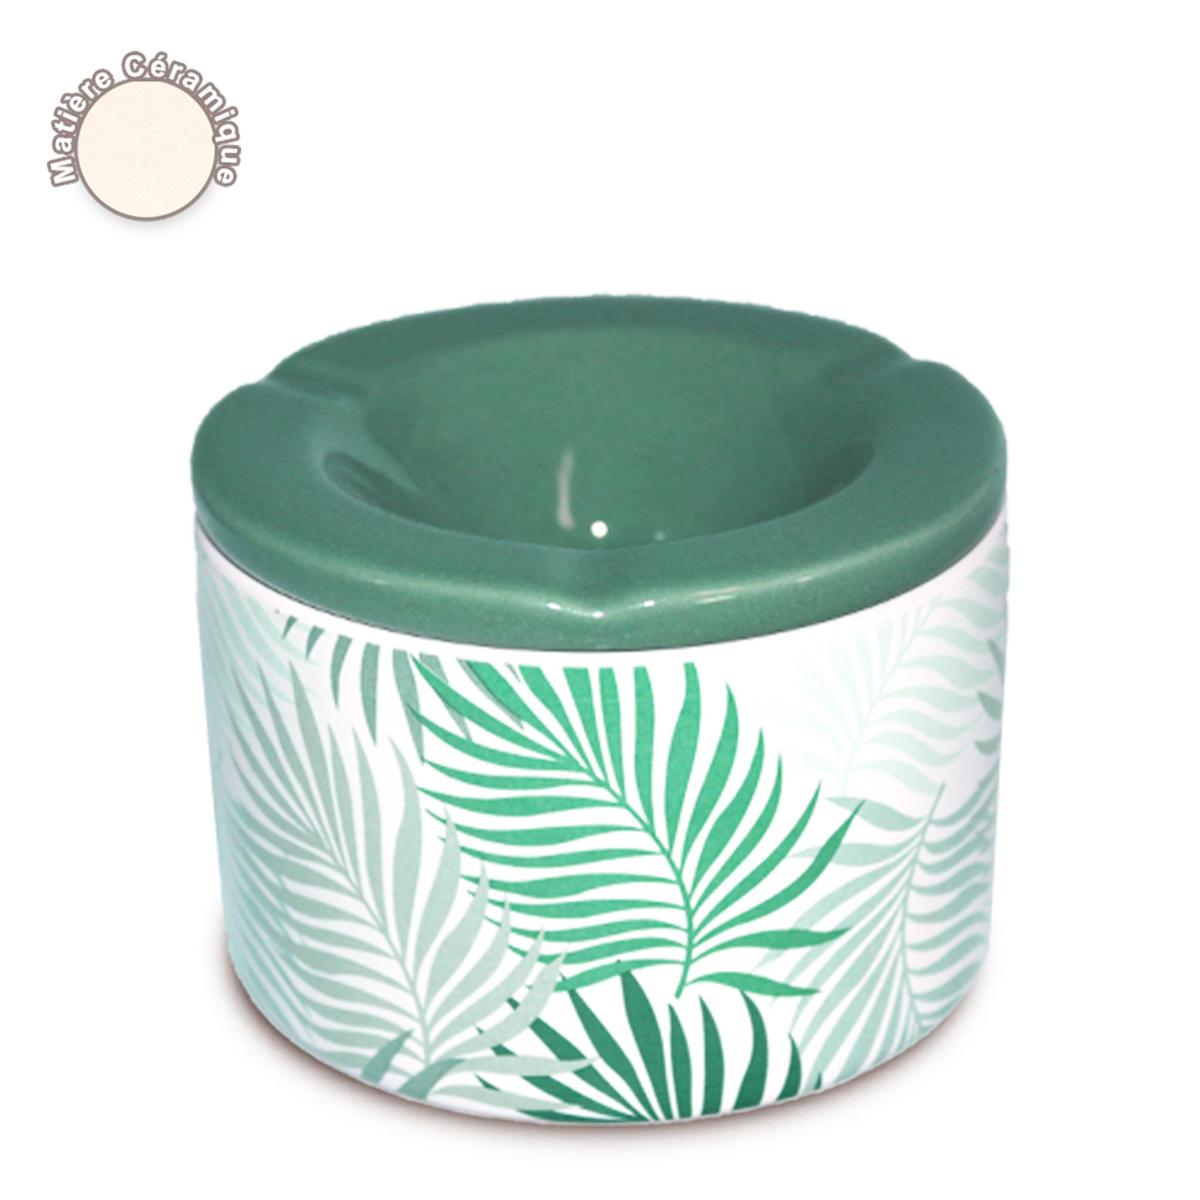 Cendrier marocain céramique \'Tropical\' vert - 10x7 cm - [A0563]